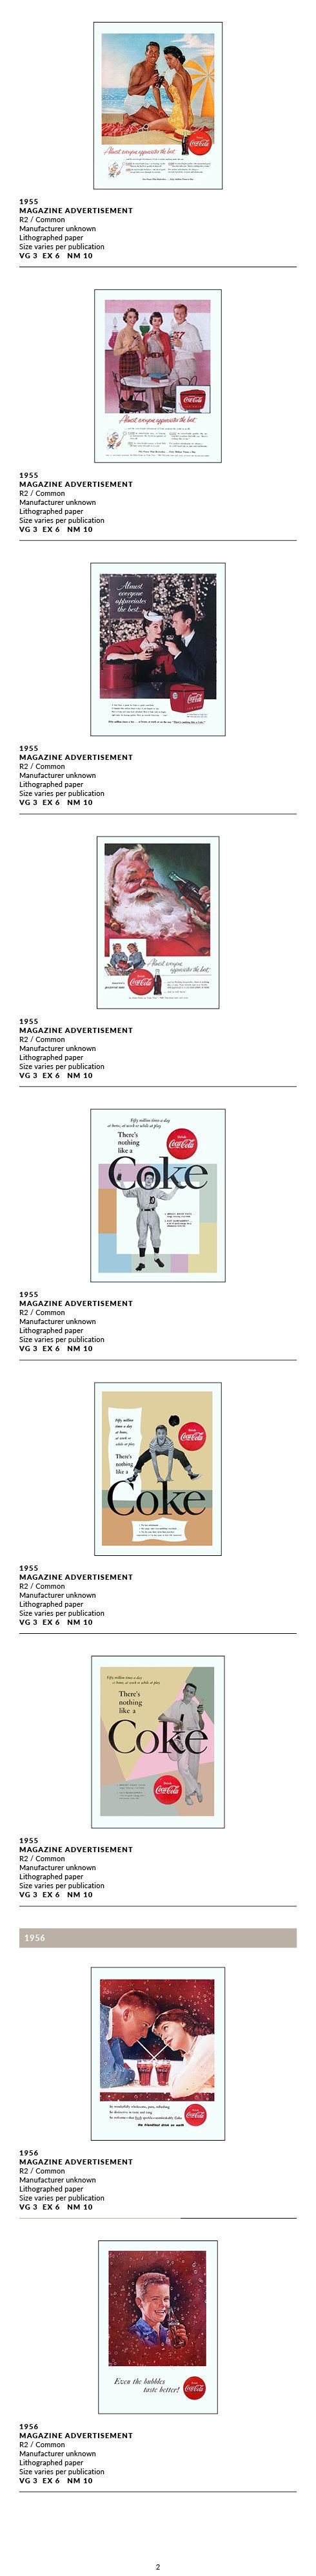 1955-59 Ads_2.jpg